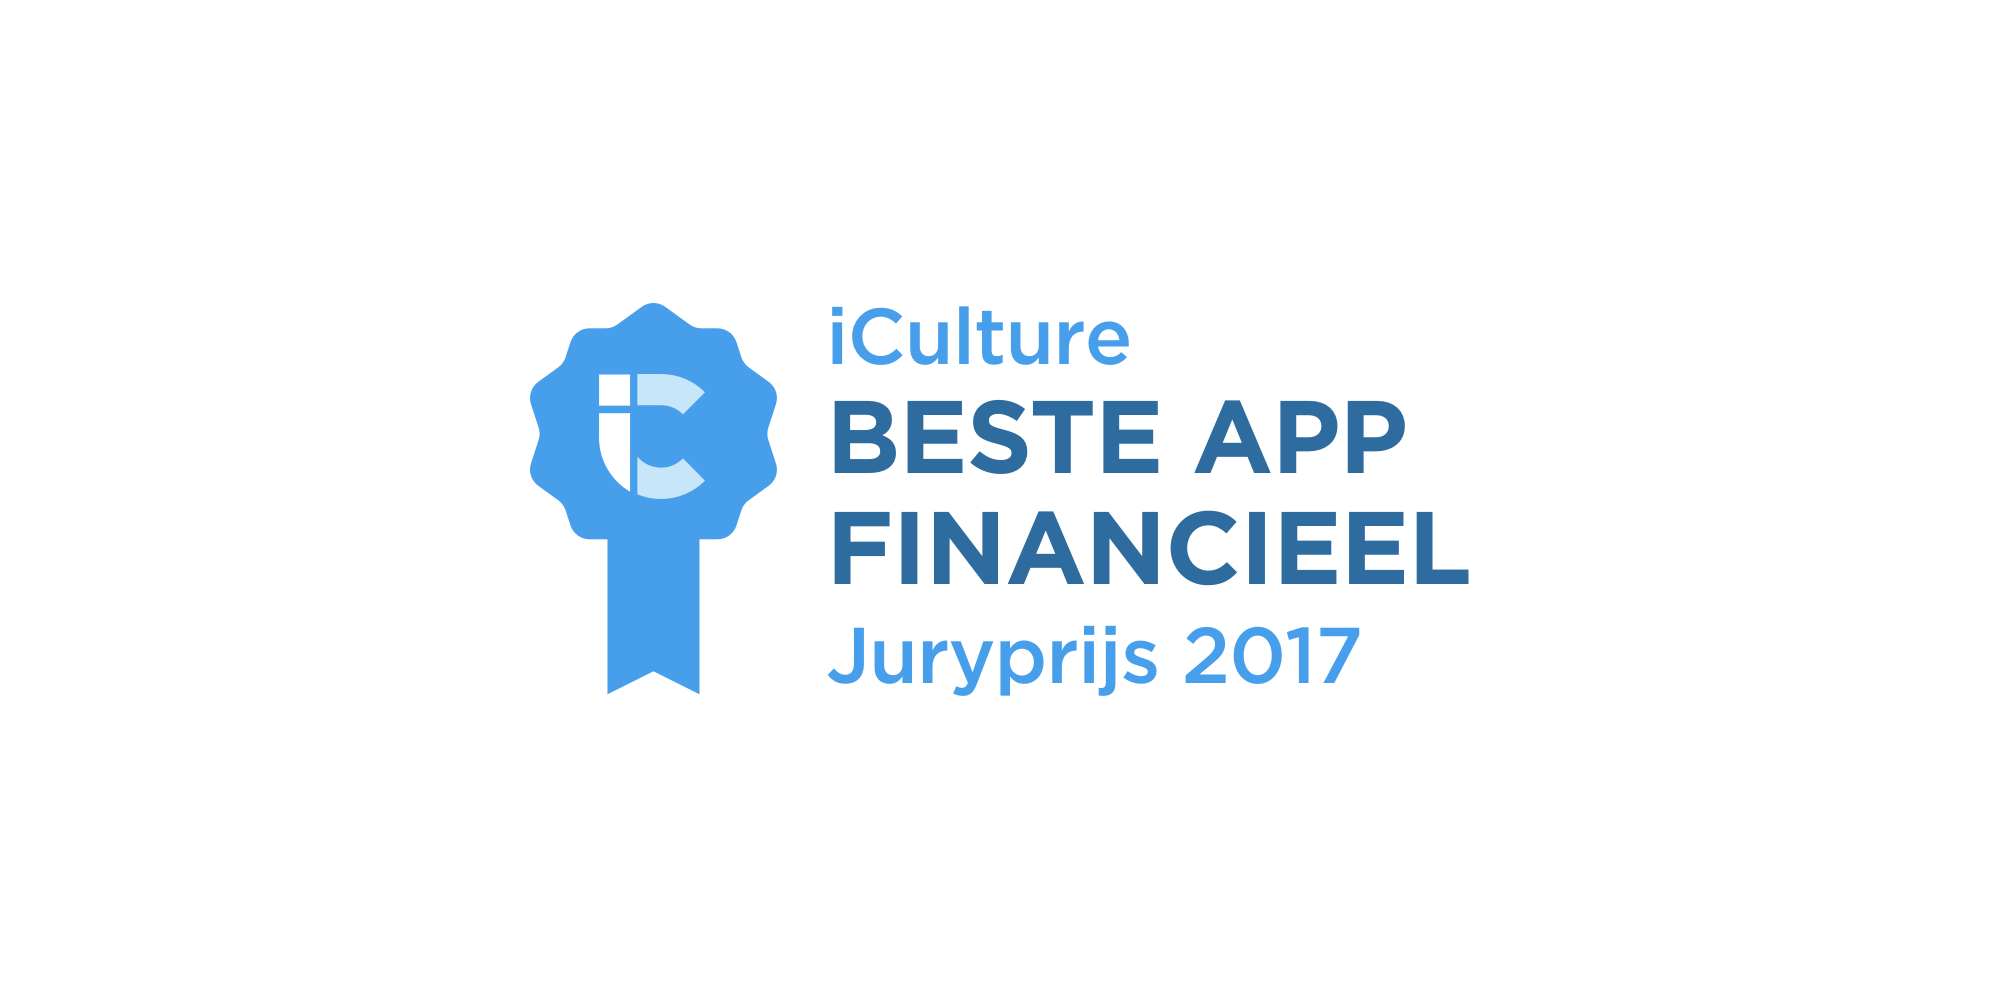 Beste Financiële App 2017